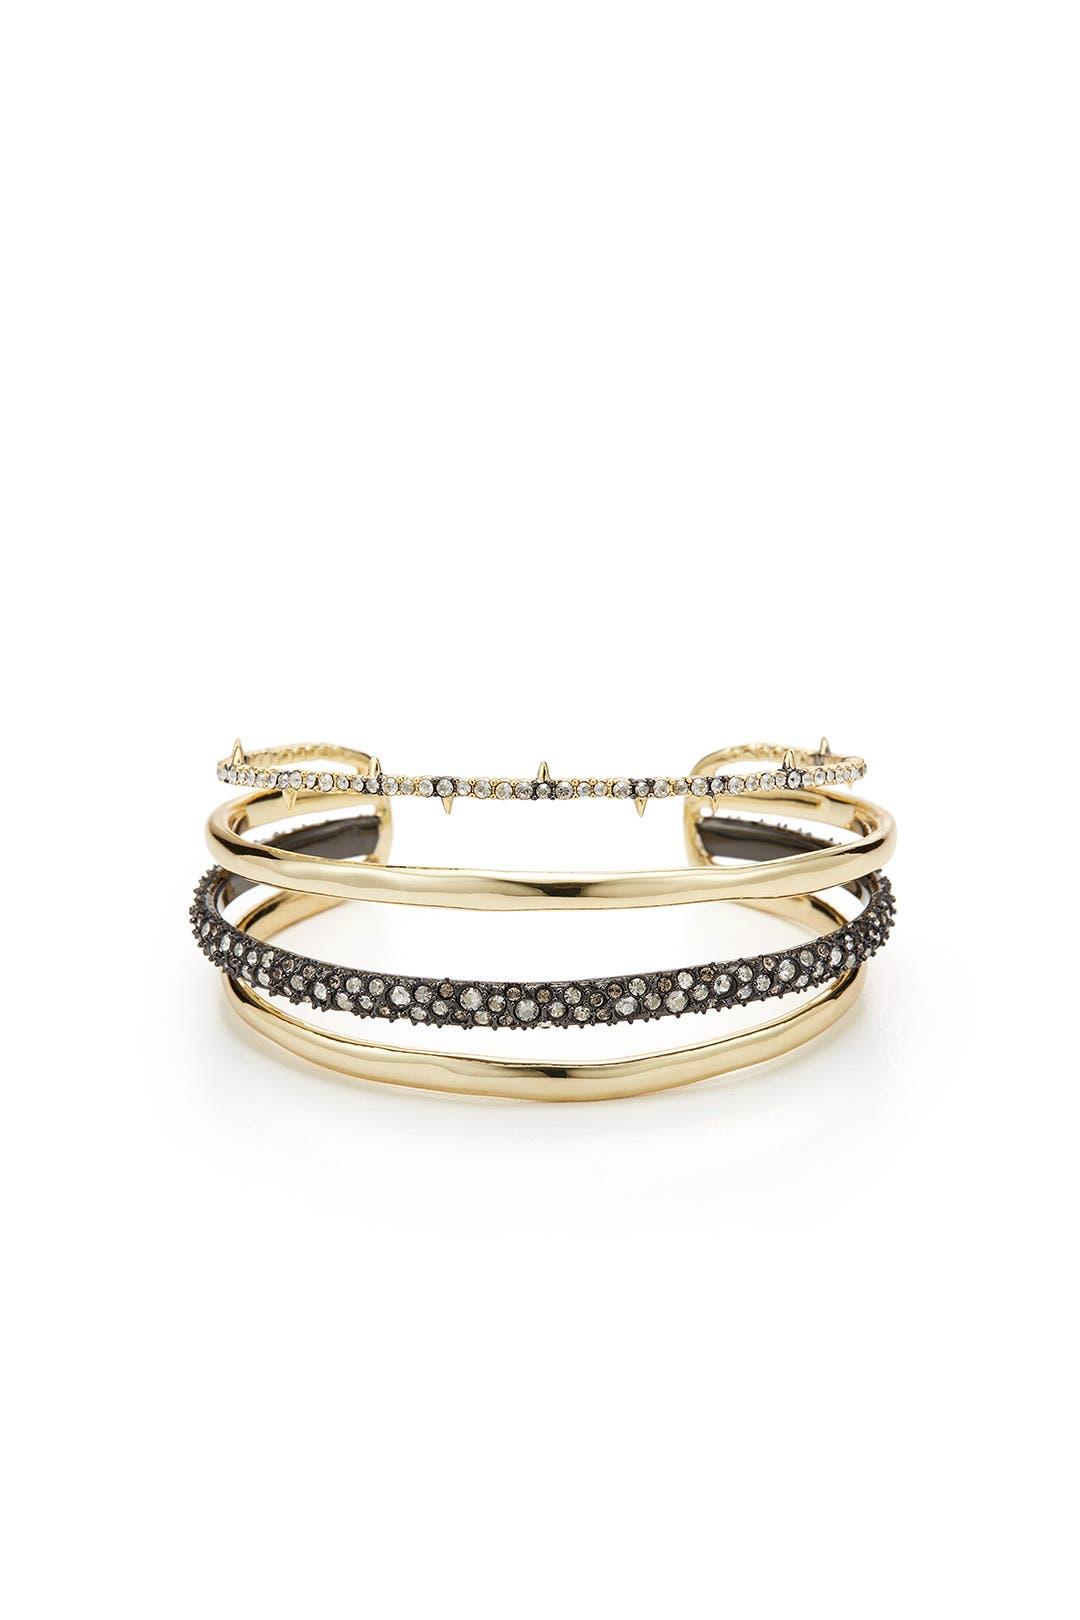 Alexis Bittar Pavé Cuff Bracelet anzUG